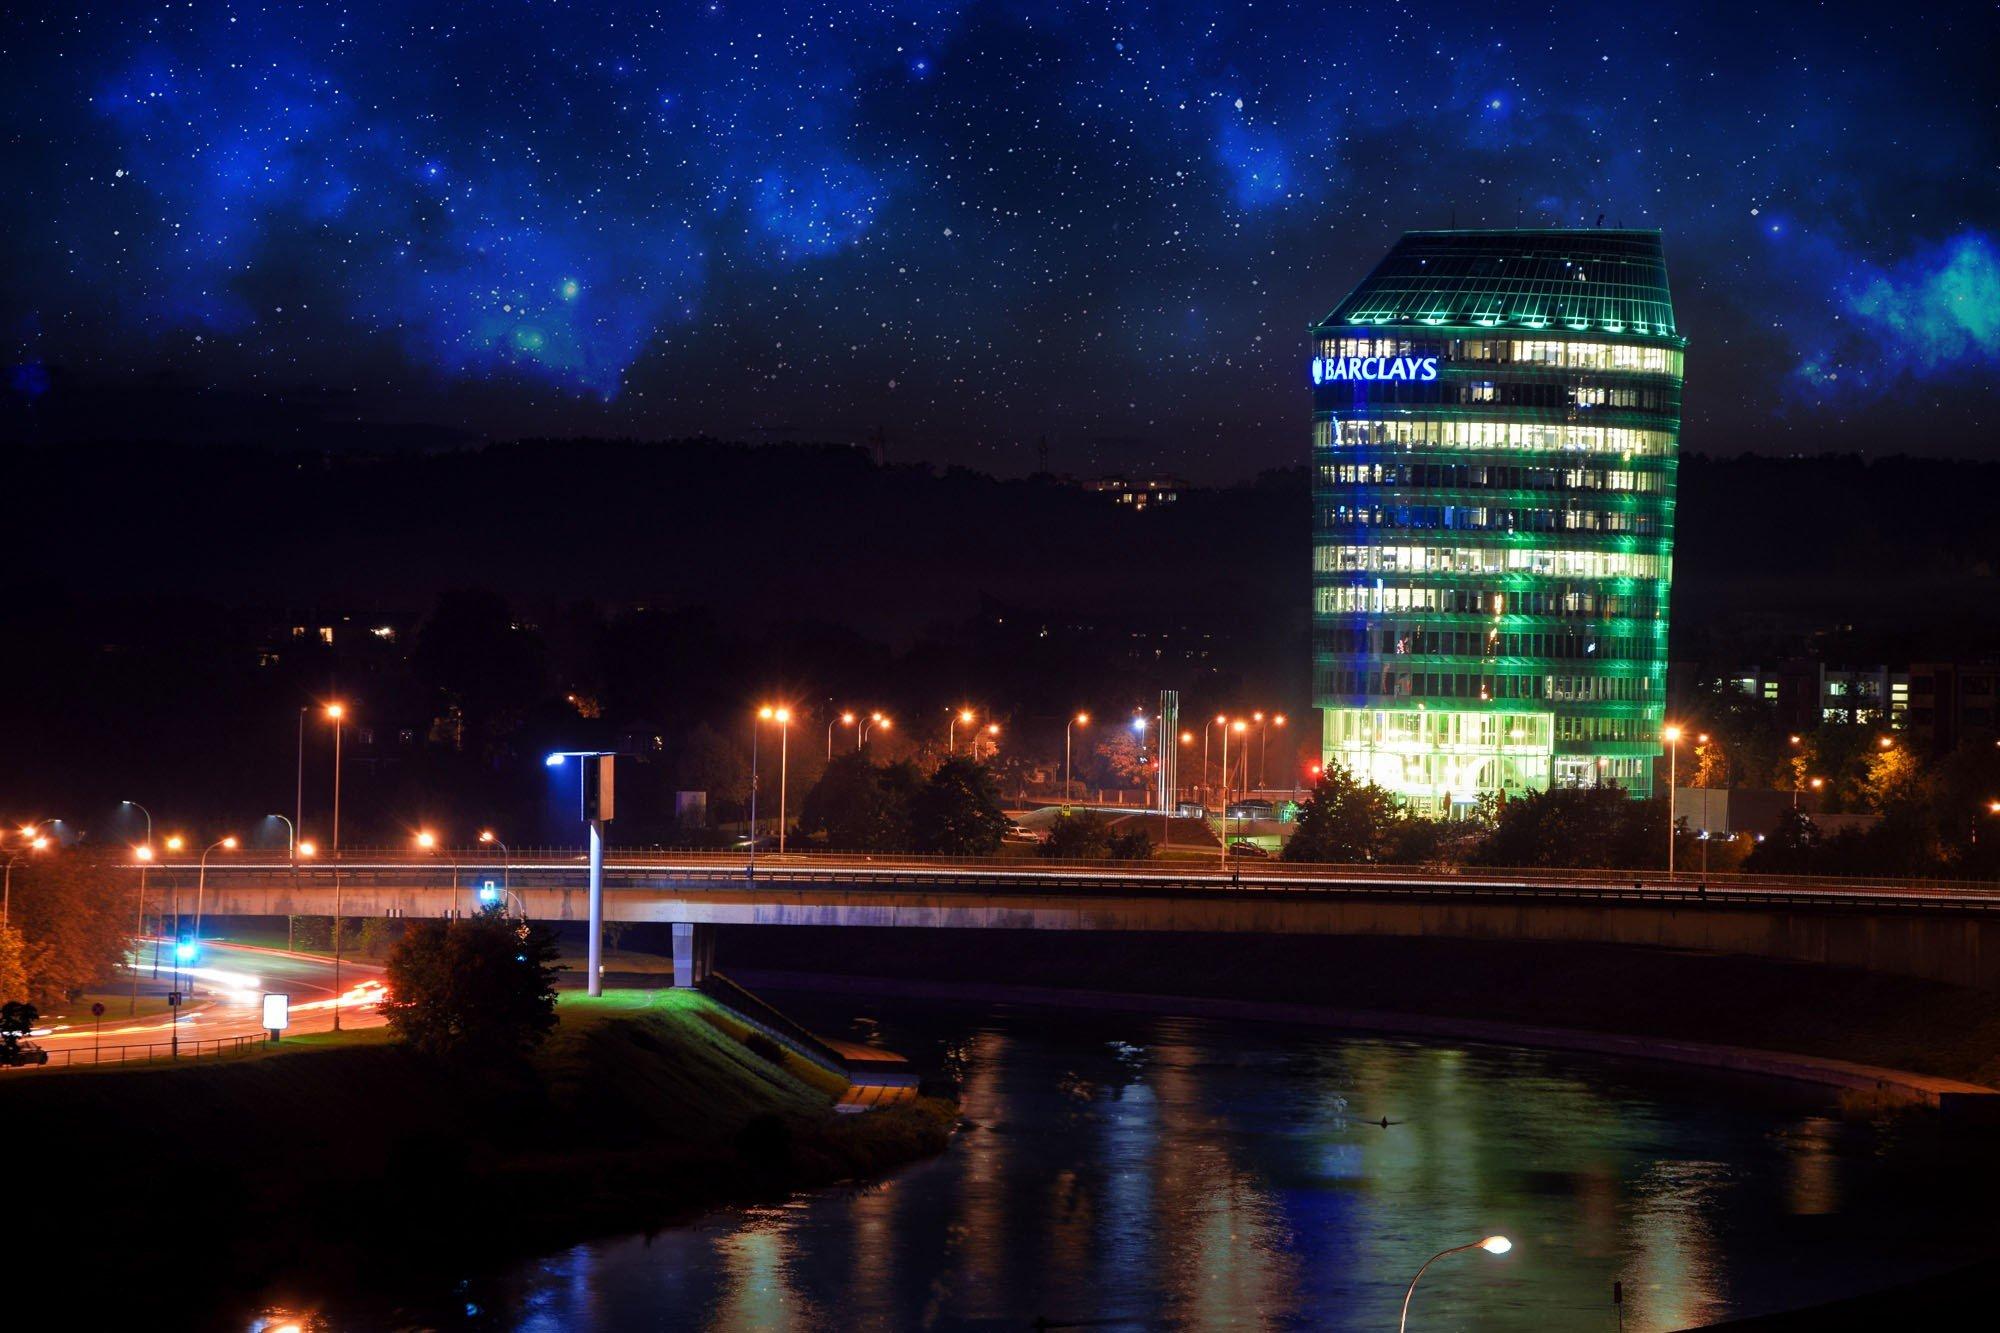 Vilnius, Nebula, Space, City, Evening, Photo manipulation, Long exposure Wallpaper